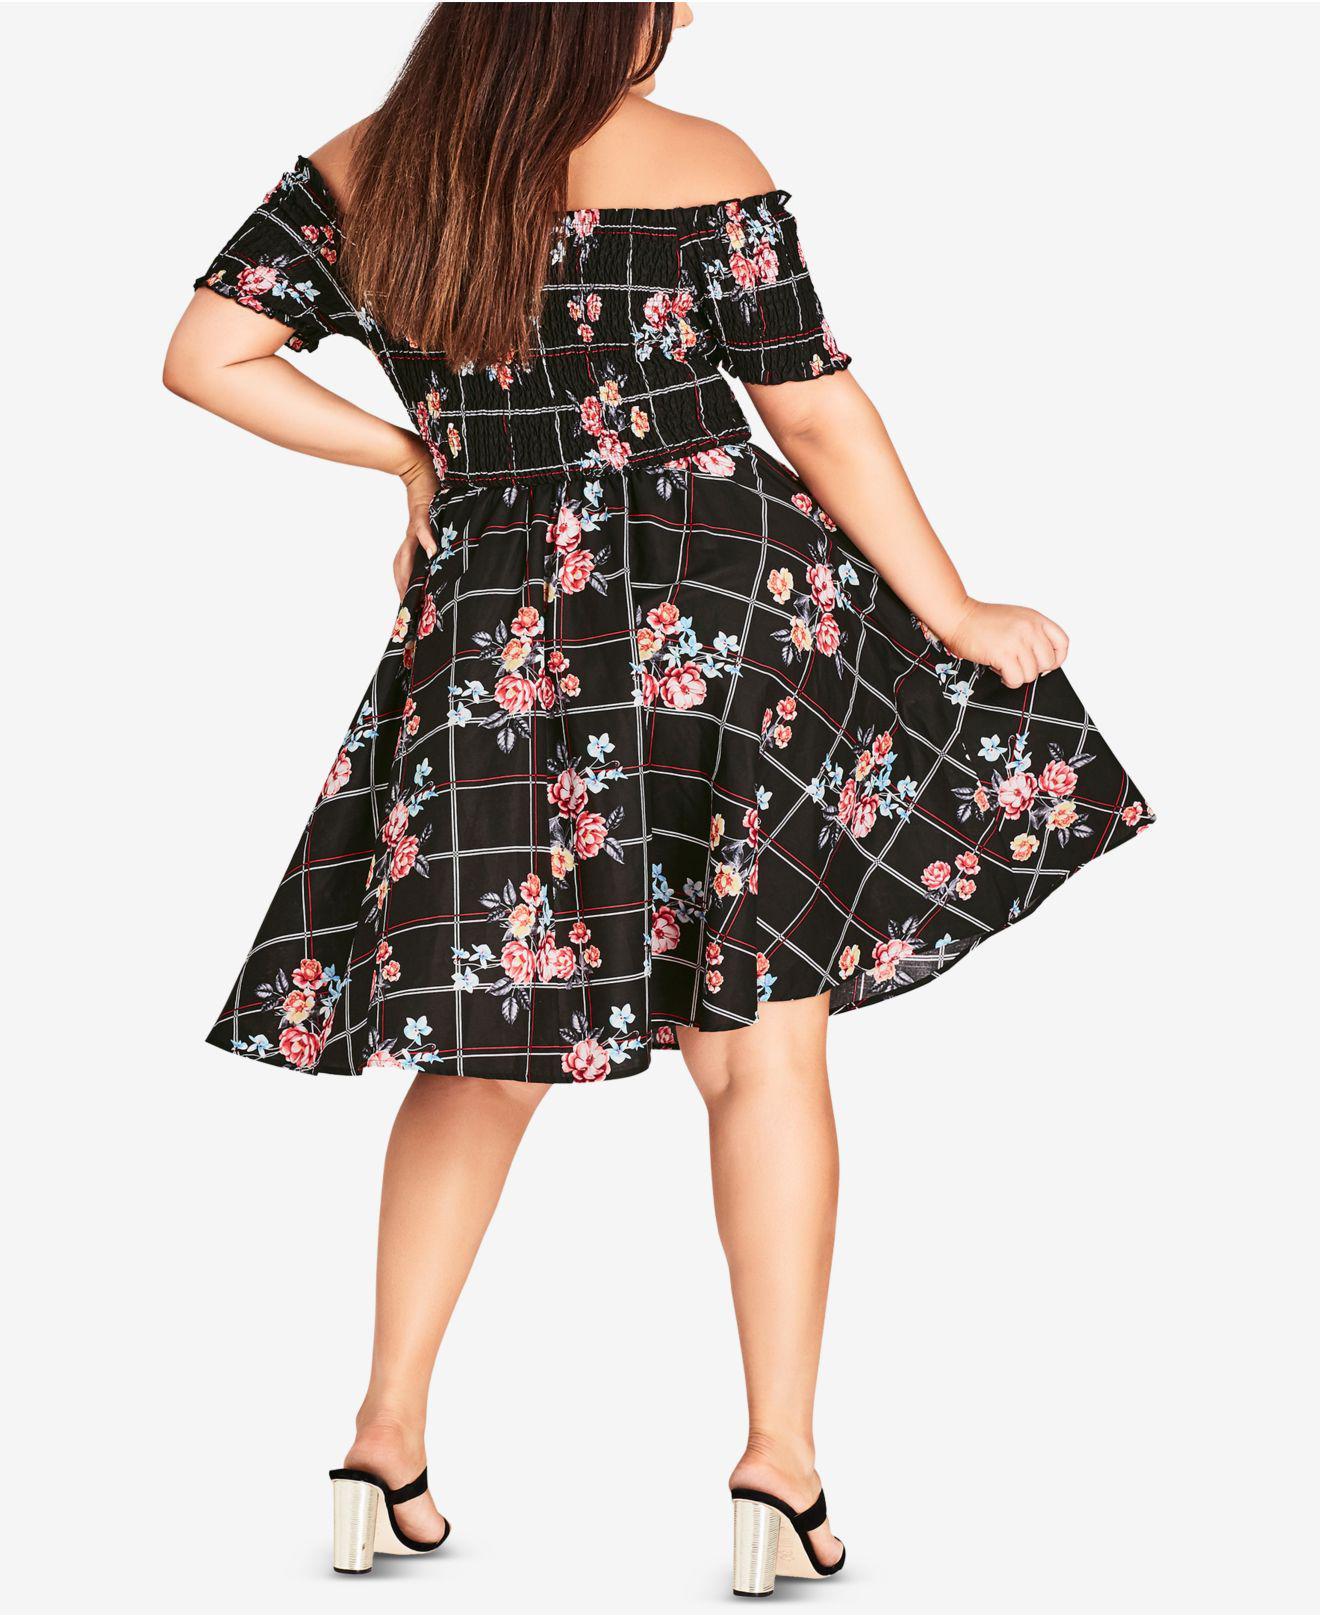 2eba8d6b1a1 Lyst - City Chic Trendy Plus Size Picnic Bouquet Cotton Printed Off-the-shoulder  Dress in Black - Save 9.174311926605498%